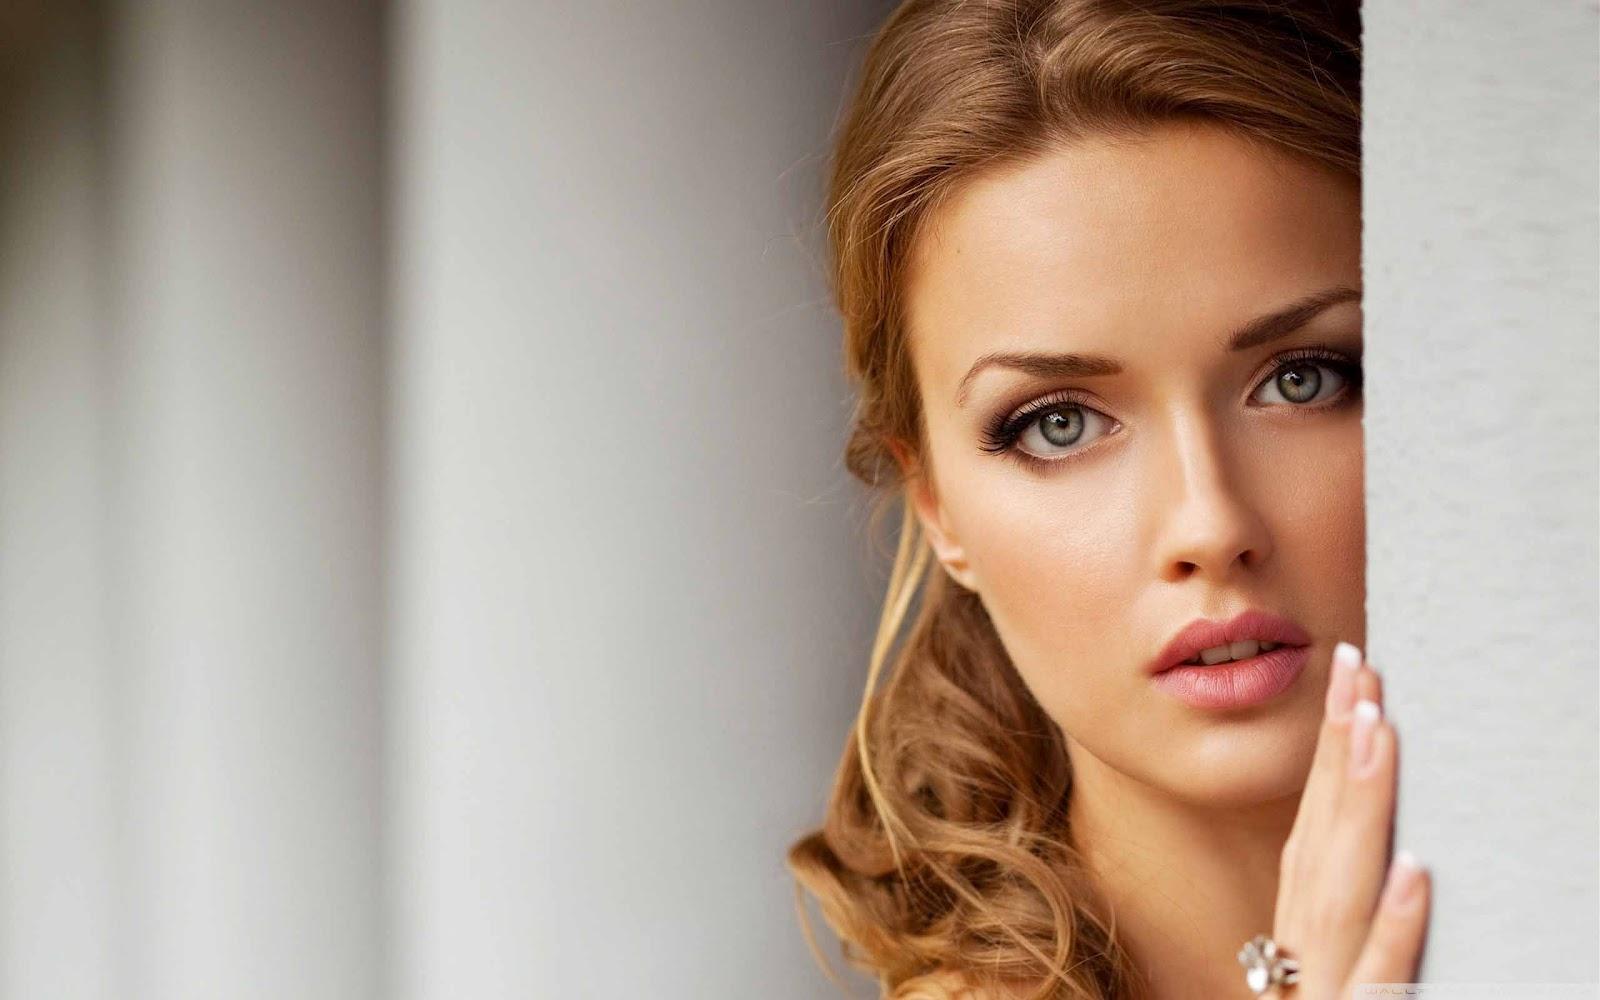 http://1.bp.blogspot.com/-DZLOrj3onjA/Ty4GqcfDFmI/AAAAAAAAAJs/si2JgOBR-lw/s1600/most_beautiful_woman-wallpaper-2560x1600.jpg